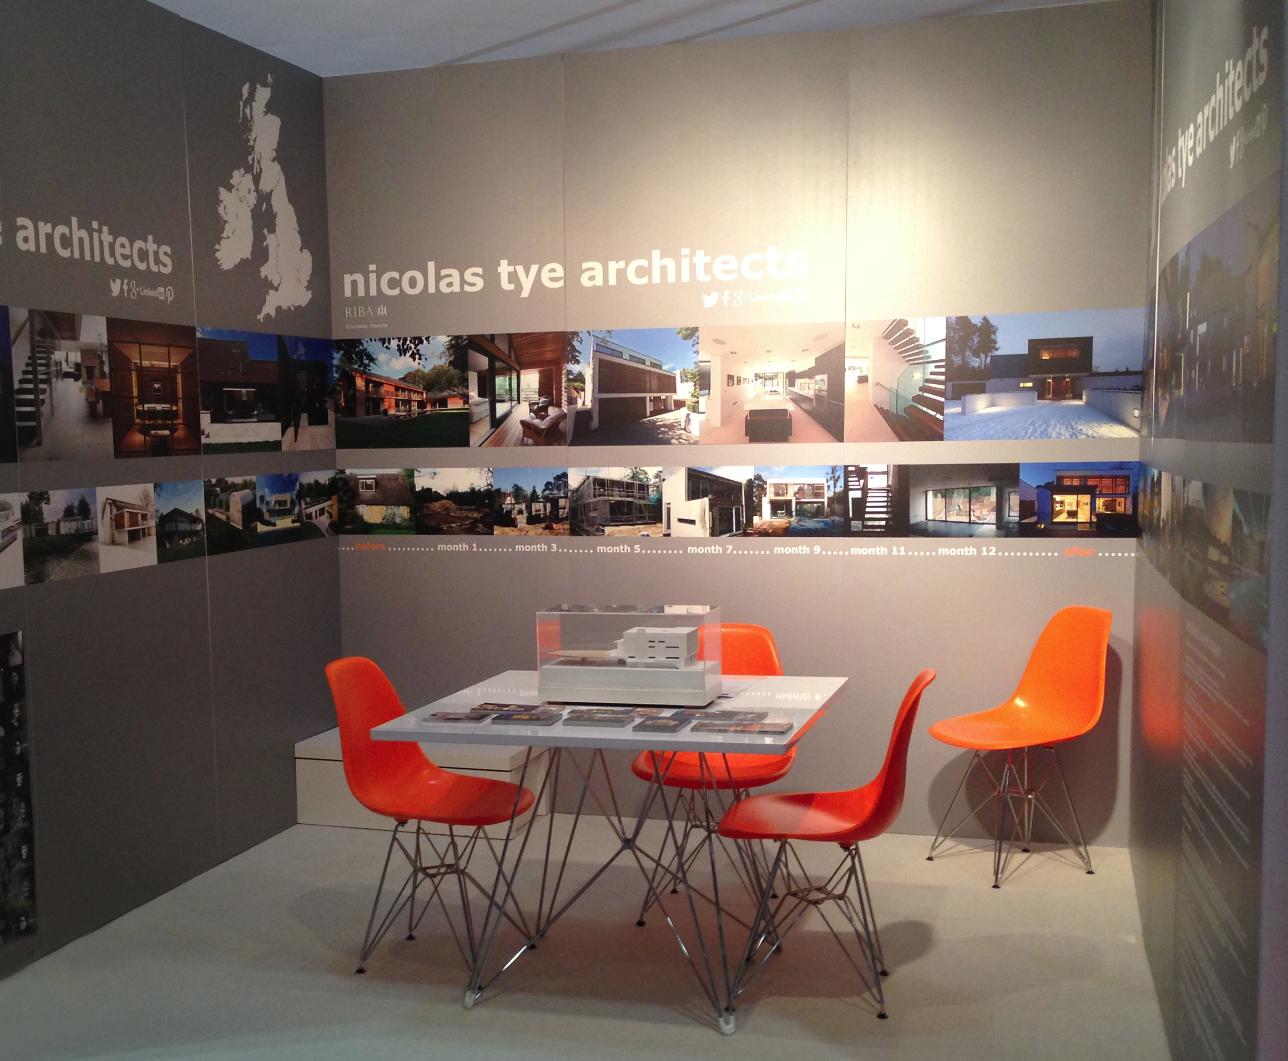 grand designs excel 2014 nicolas tye architects